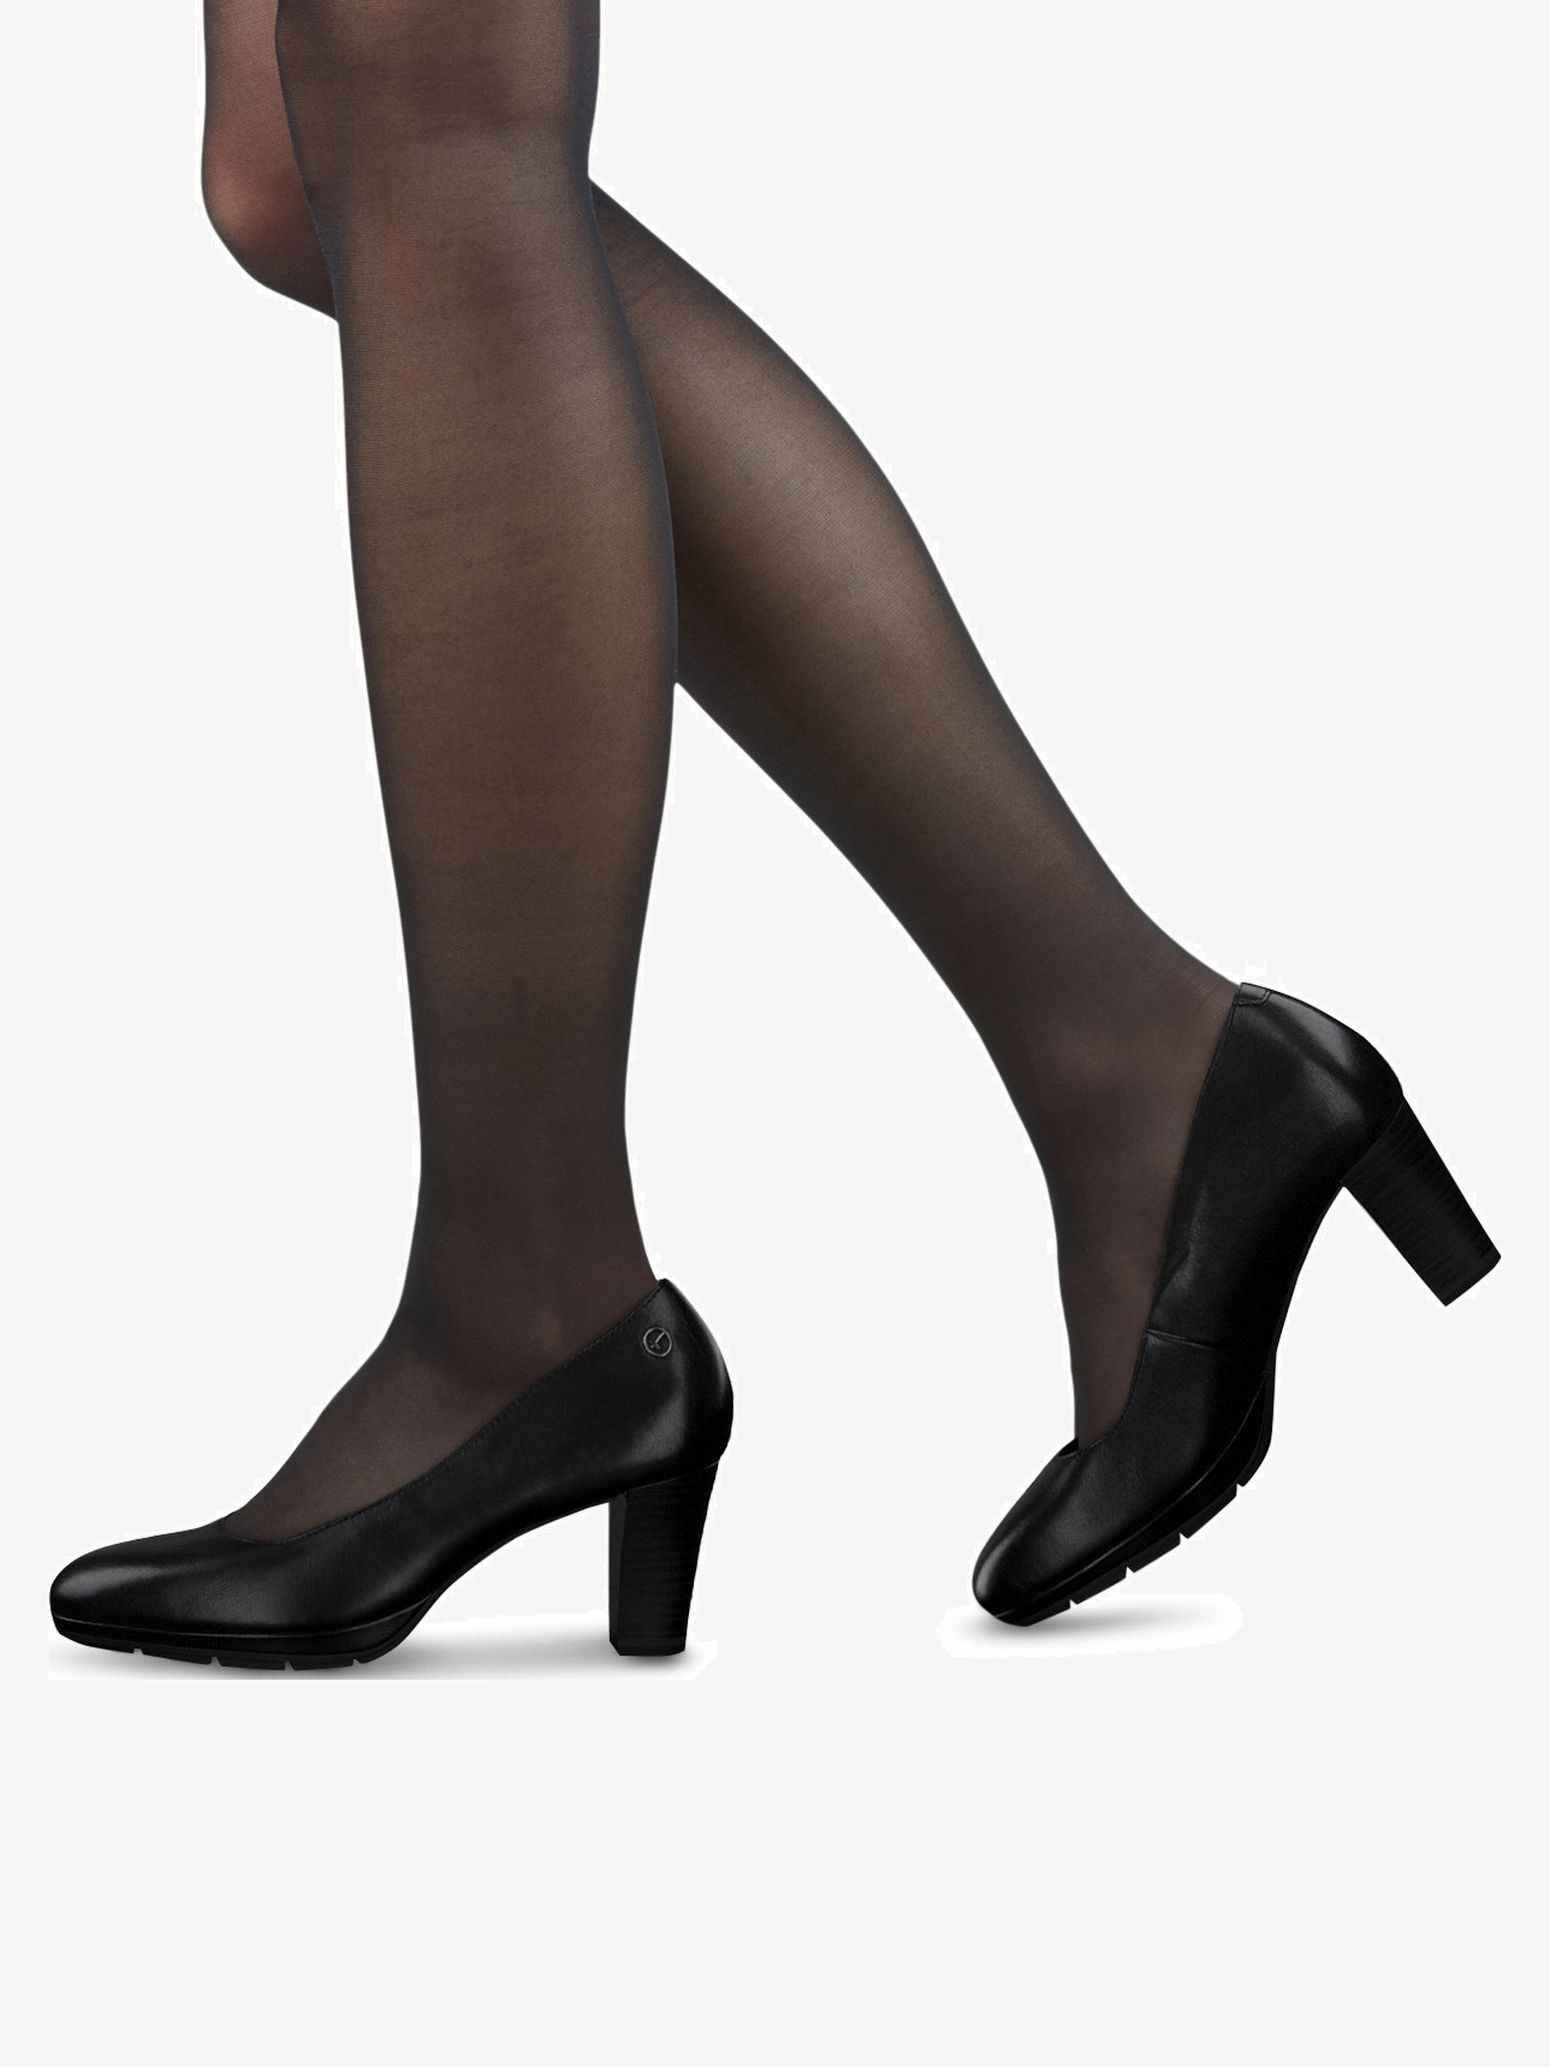 Chaussures basses TAMARIS 1 22438 21 Black Leather 003 Noir